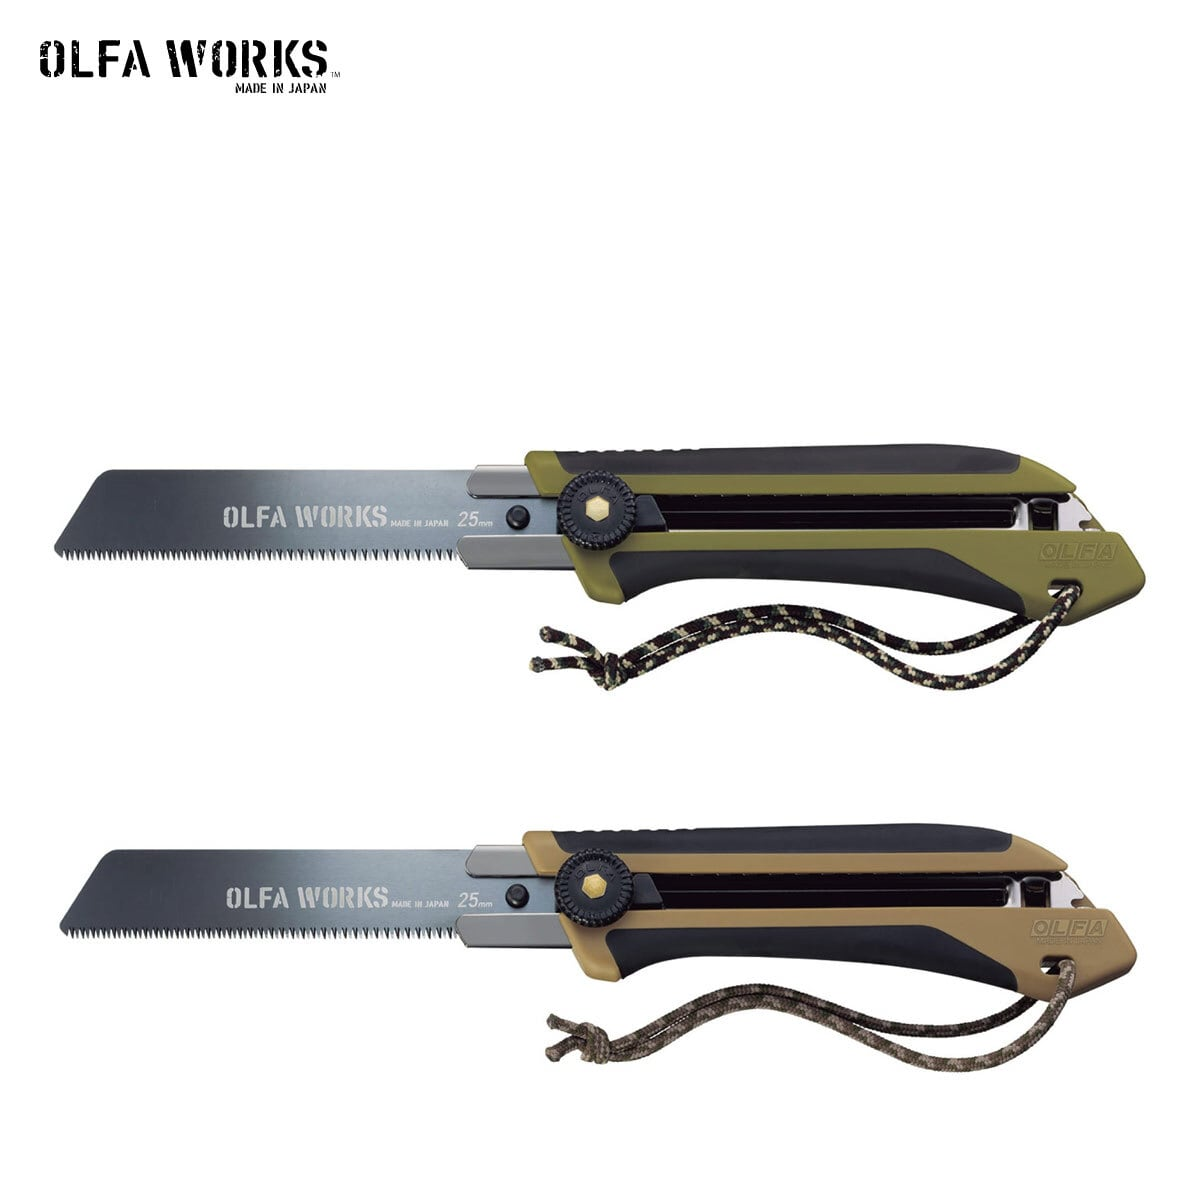 OLFA WORKS 替刃式フィールドノコギリ FS1